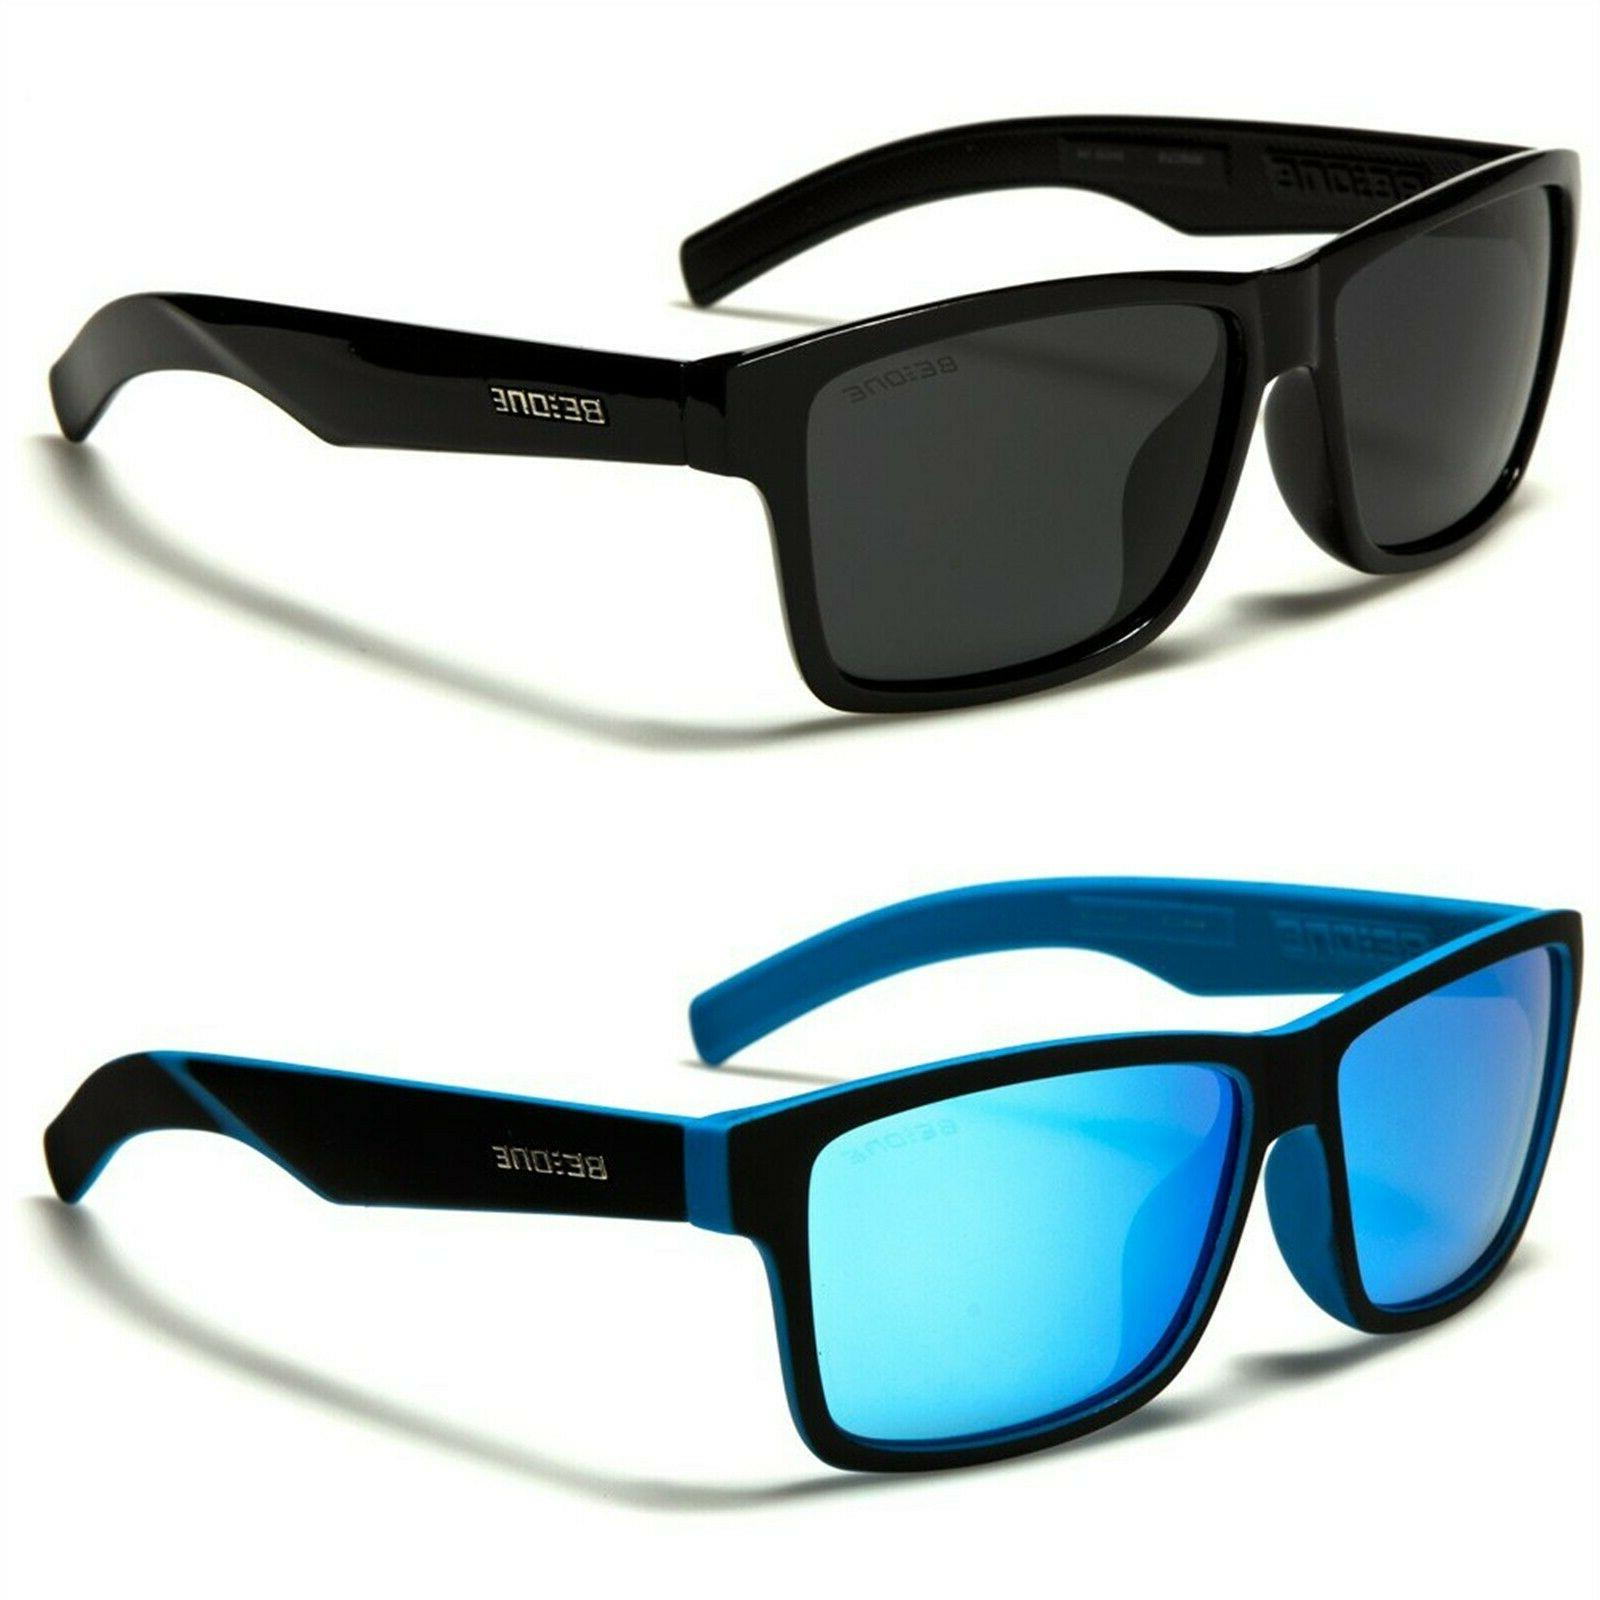 classic polarized rectangle men s fashion sunglasses